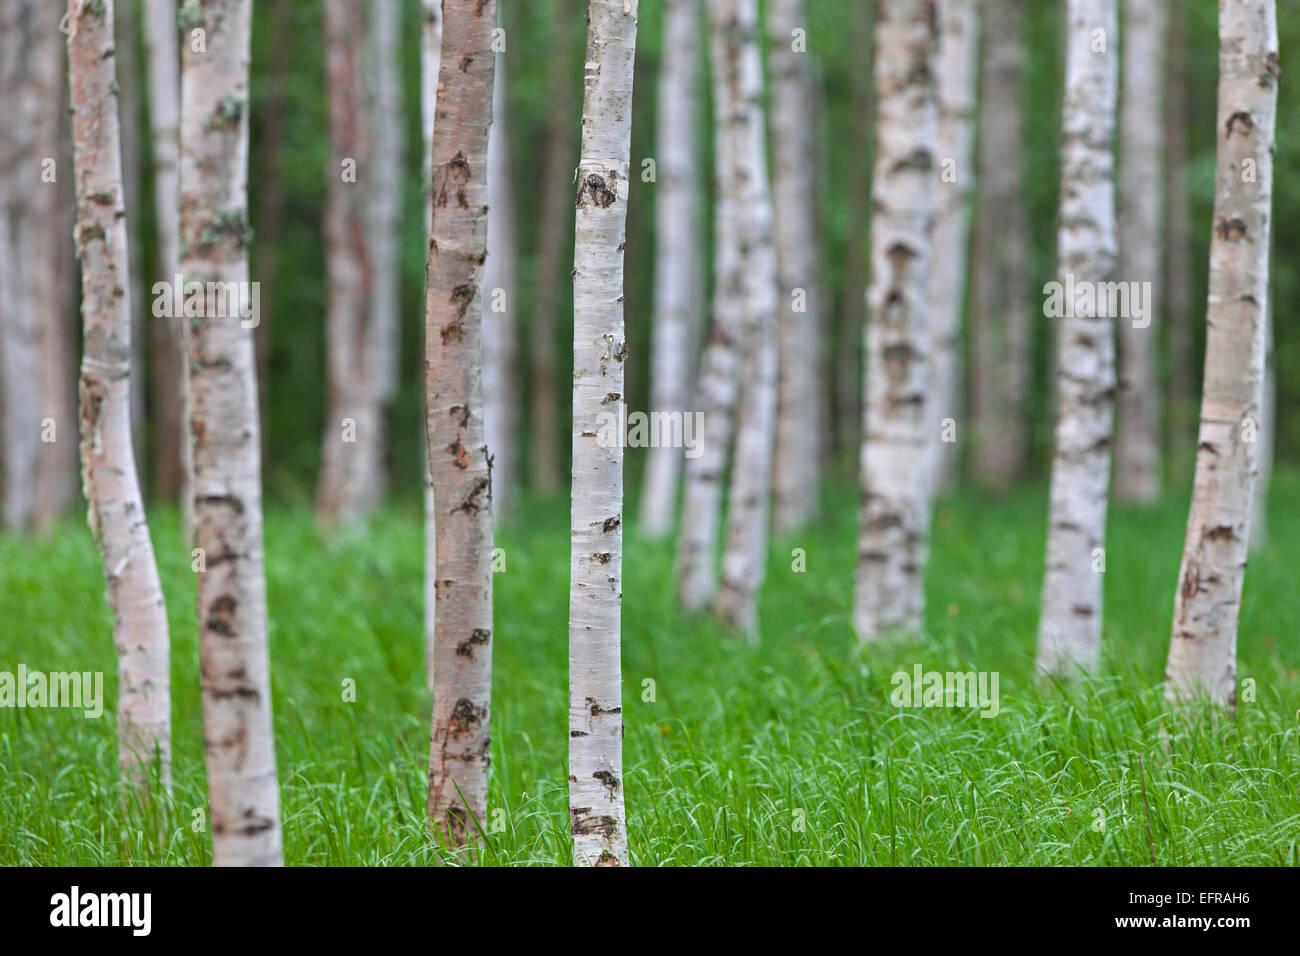 Silver birch / warty birch (Betula pendula / Betula alba / Betula verrucosa) tree trunks of birches in deciduous - Stock Image